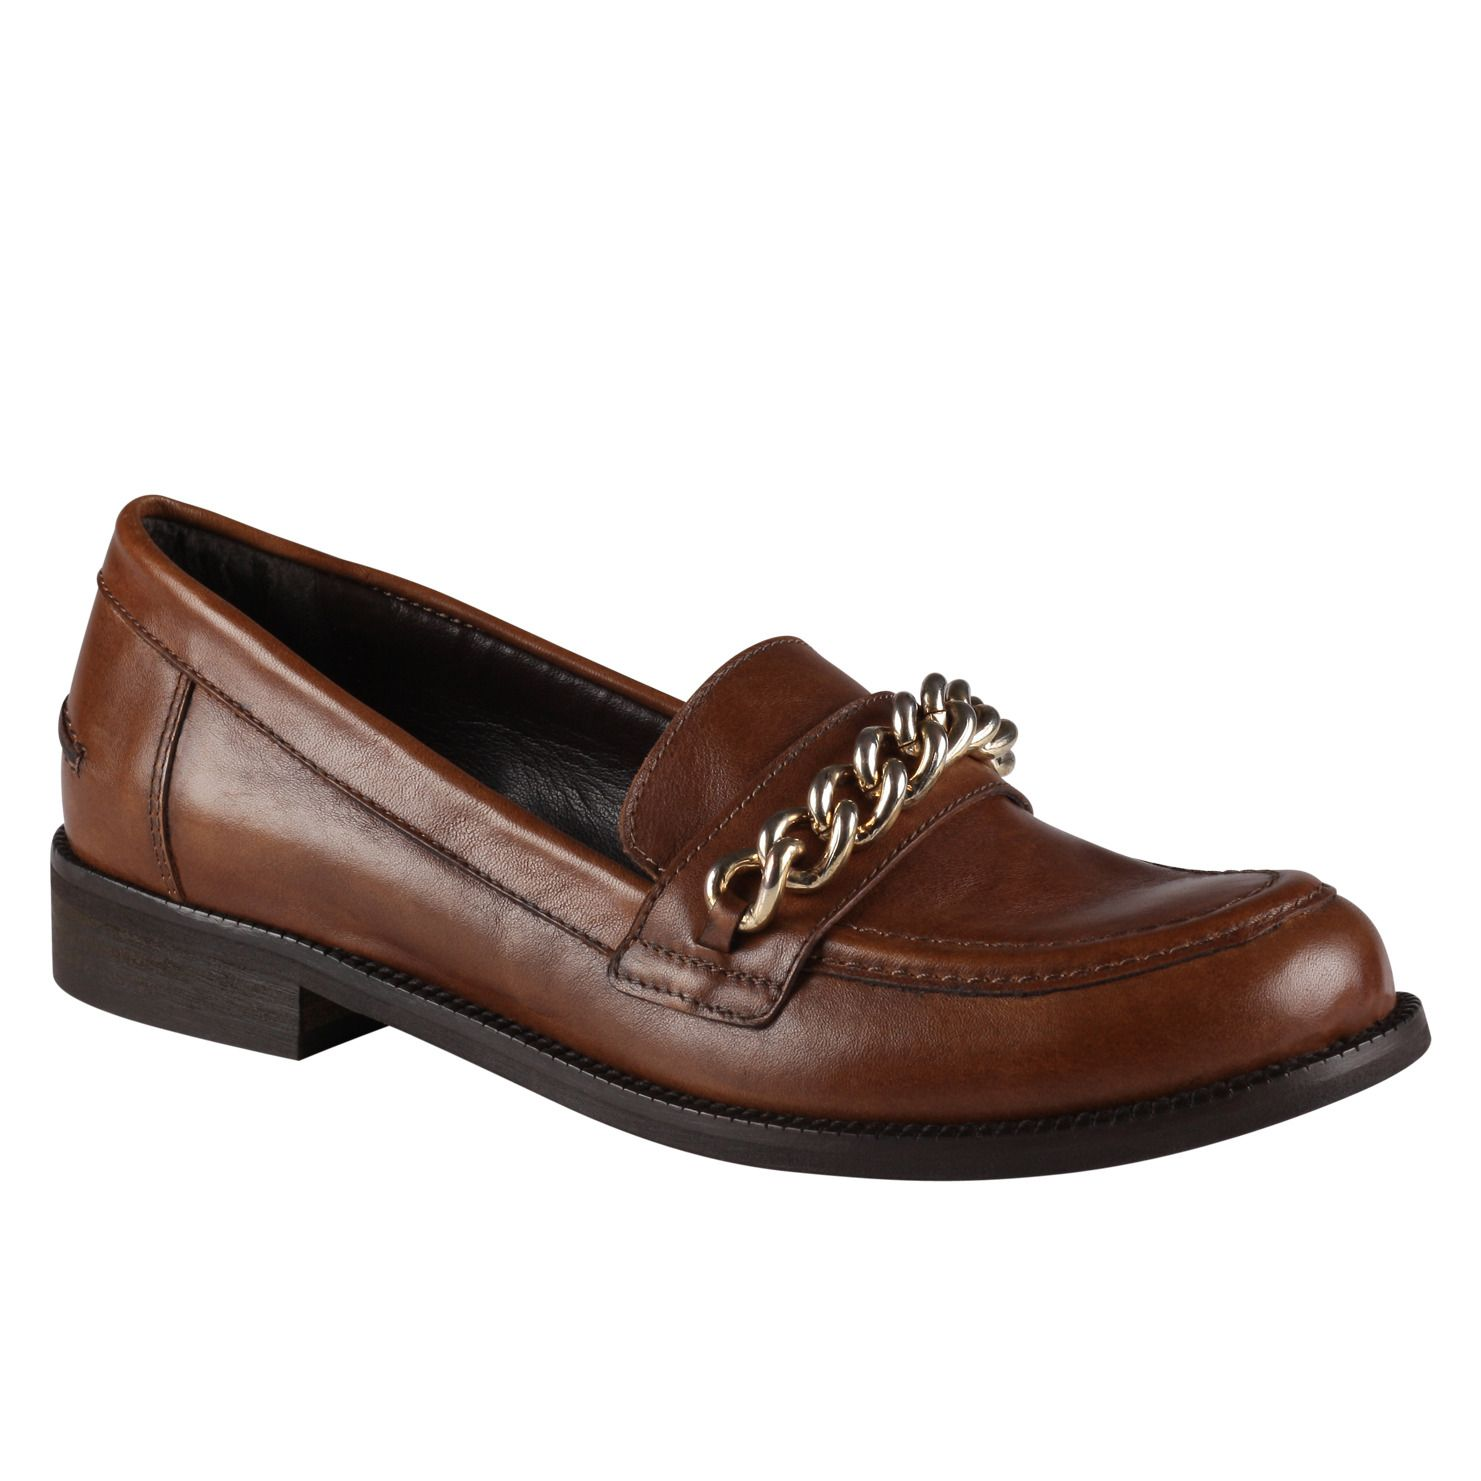 TRANTHI - sale's sale shoes women for sale at ALDO Shoes.